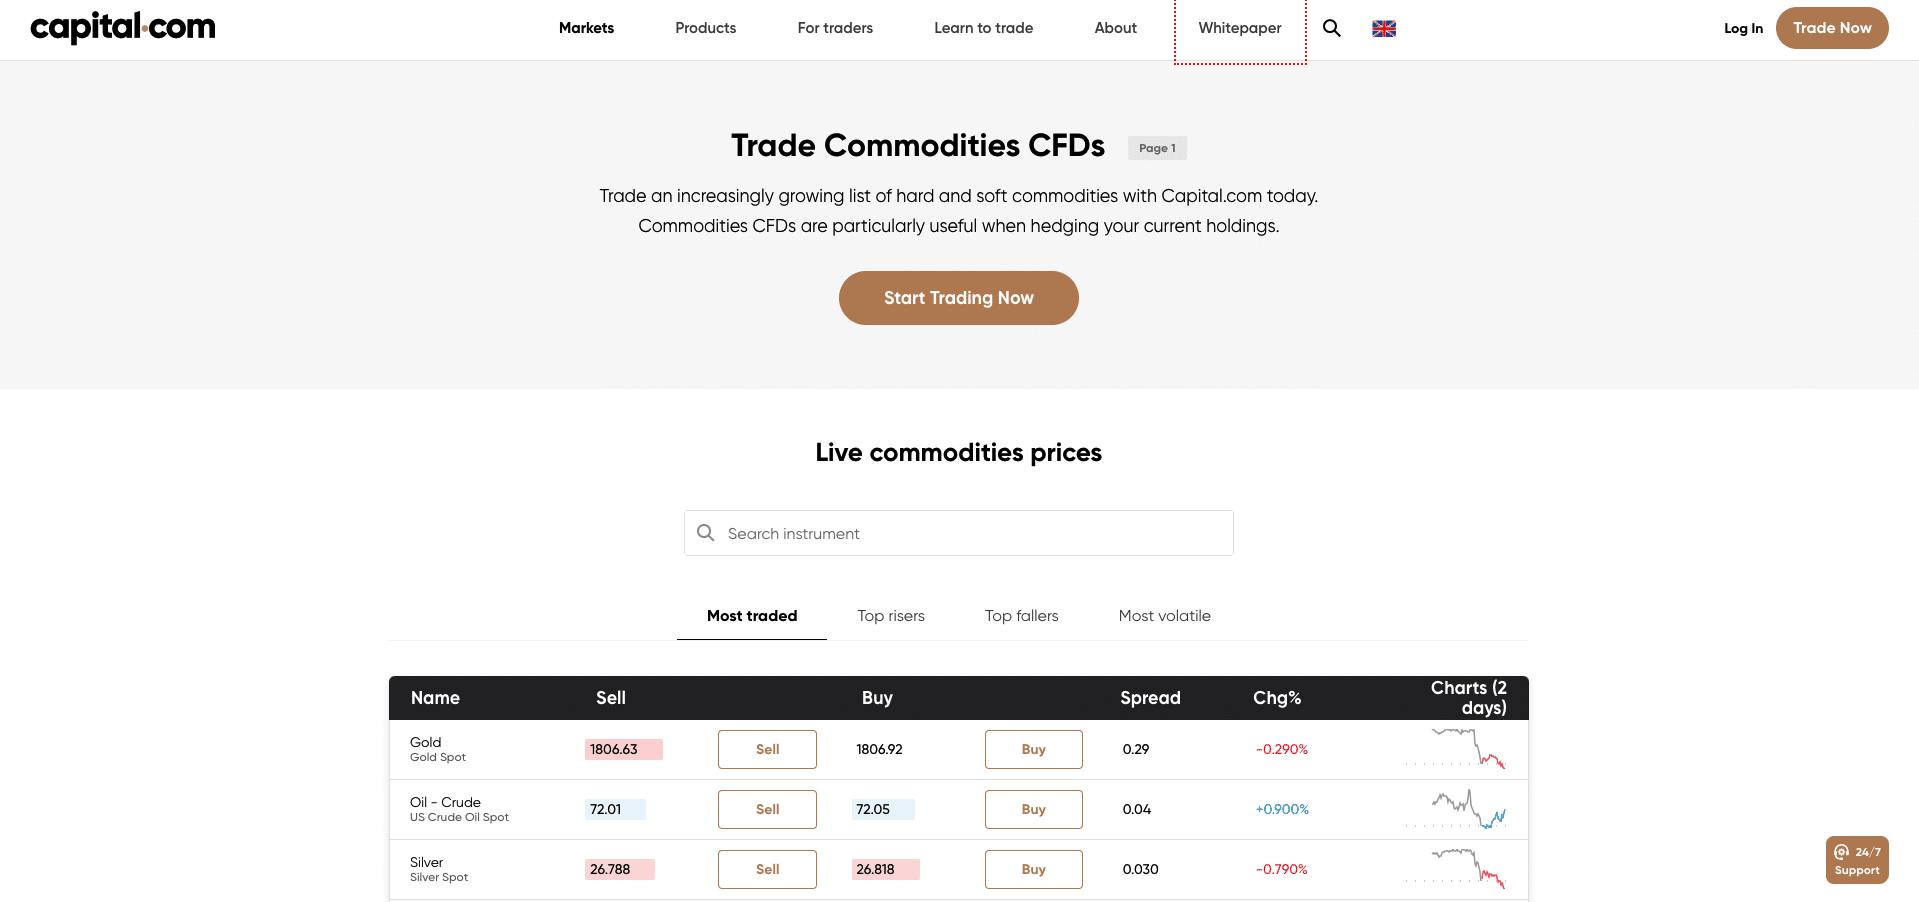 capital.com commodities